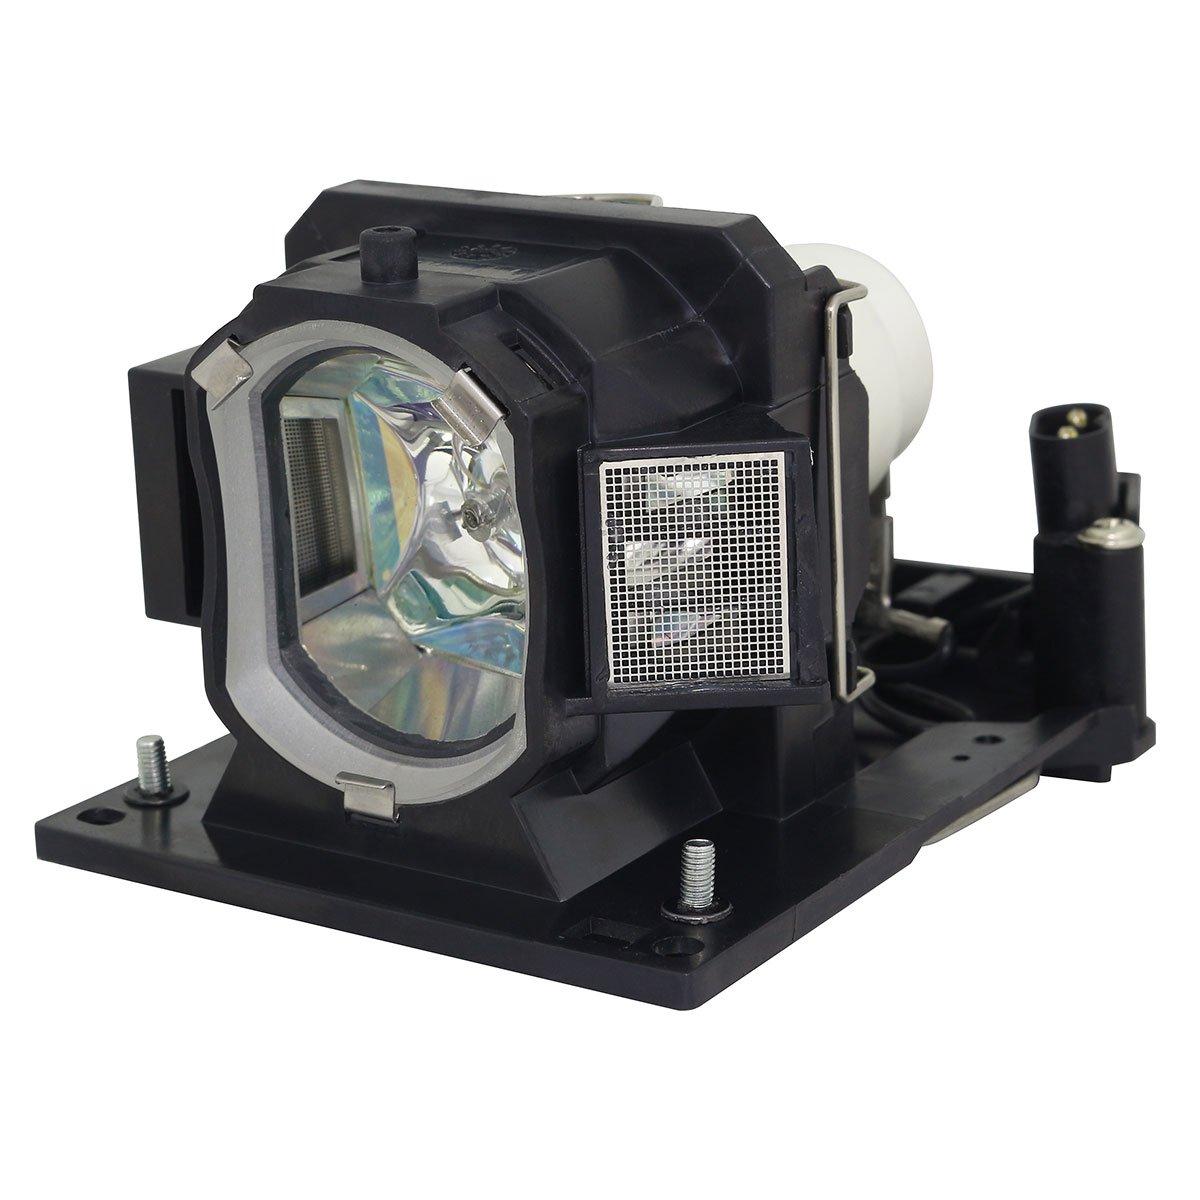 Lutema OEMプロジェクター交換用ランプ ハウジング/電球付き 日立CP-EX251N用 Economy Economy Lamp with Housing B07KTKVDZB